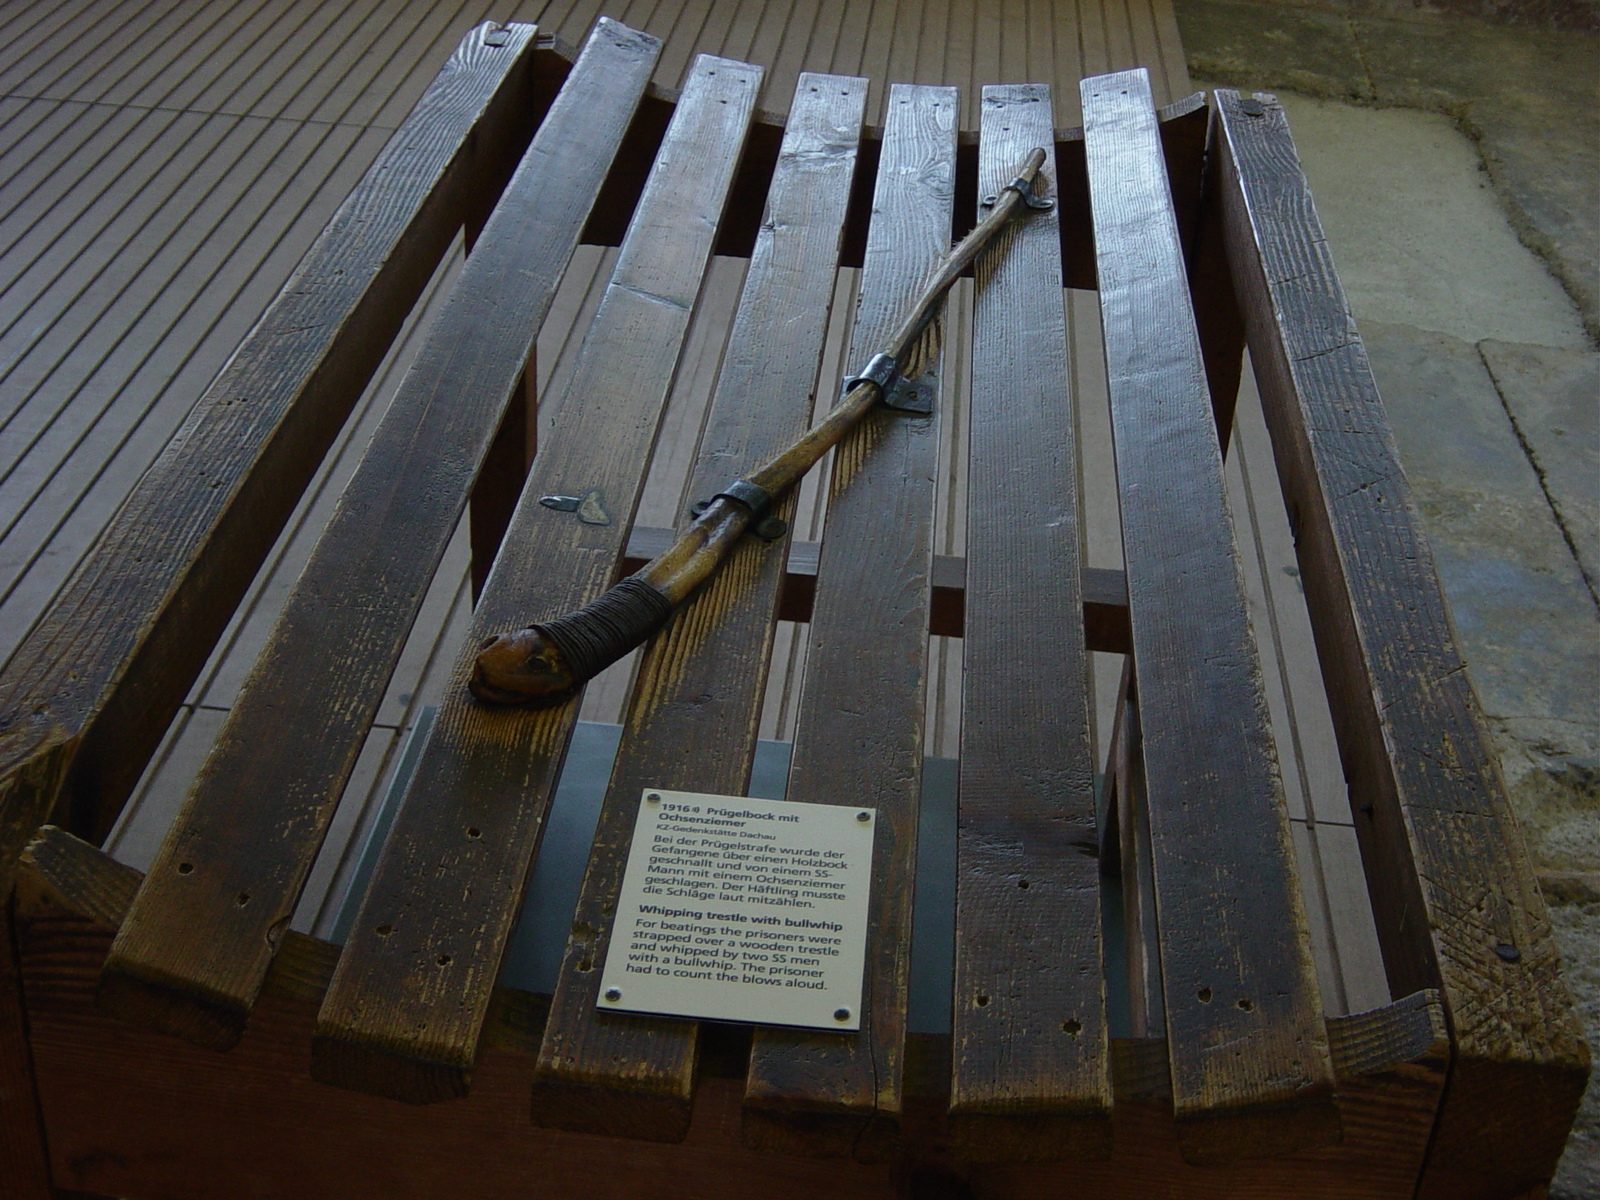 Rohrstock Strafe